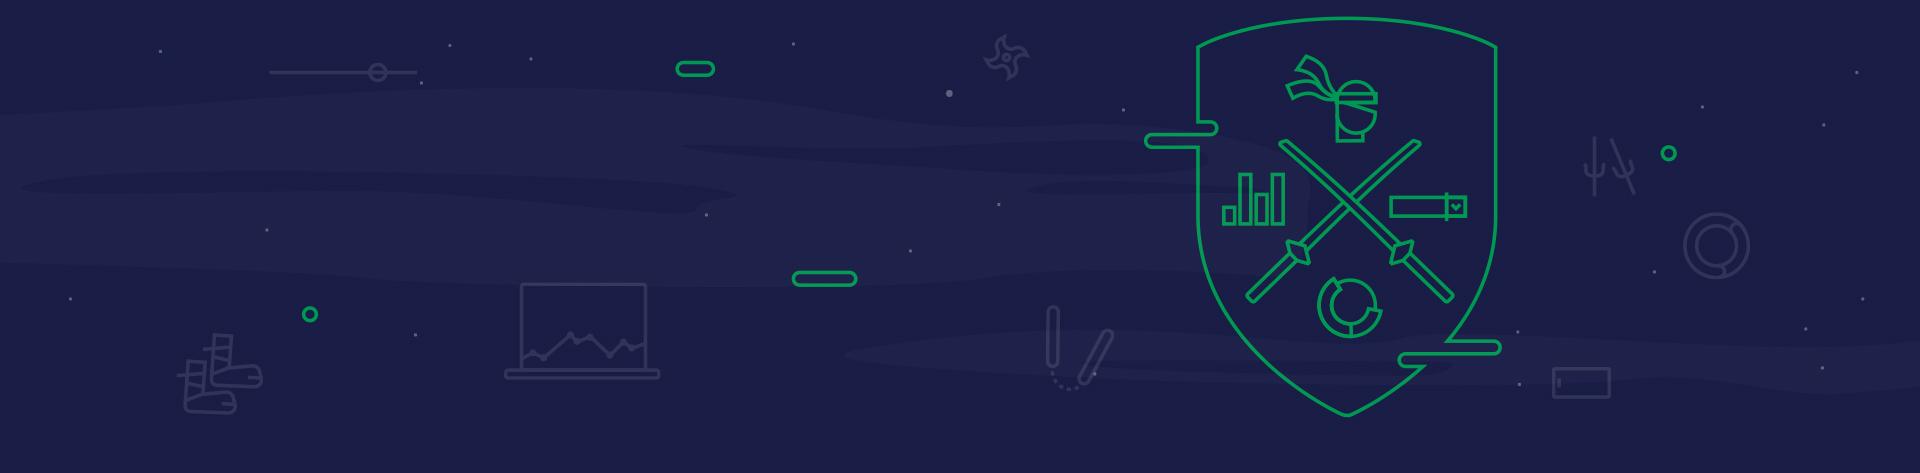 Telerik UI Tools R1 2018 Release Webinar